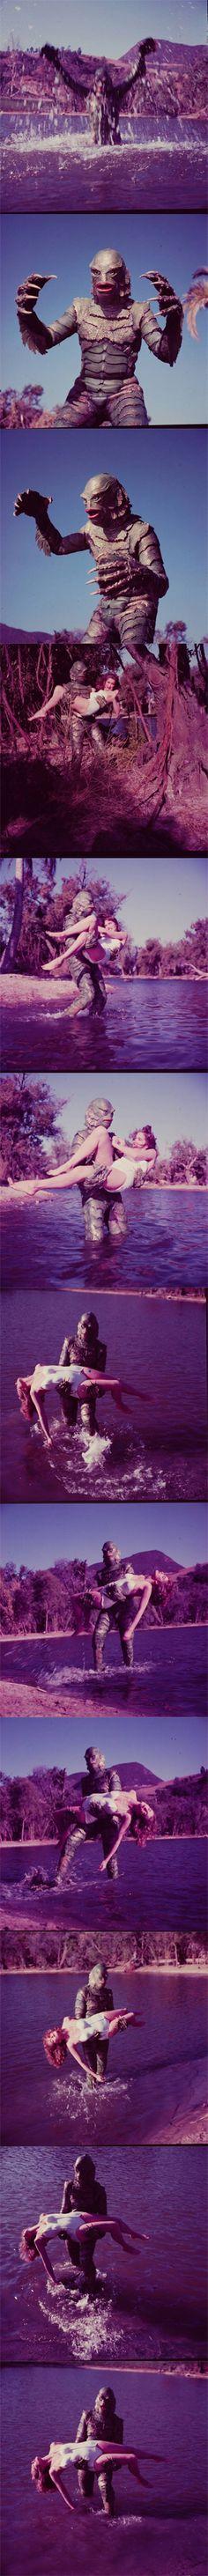 Secuencia de fotos de la revista LIFE sobre La mujer y el monstruo Life Magazine, Daenerys Targaryen, Horror, Game Of Thrones Characters, Films, Fictional Characters, Art, Monsters, Movies